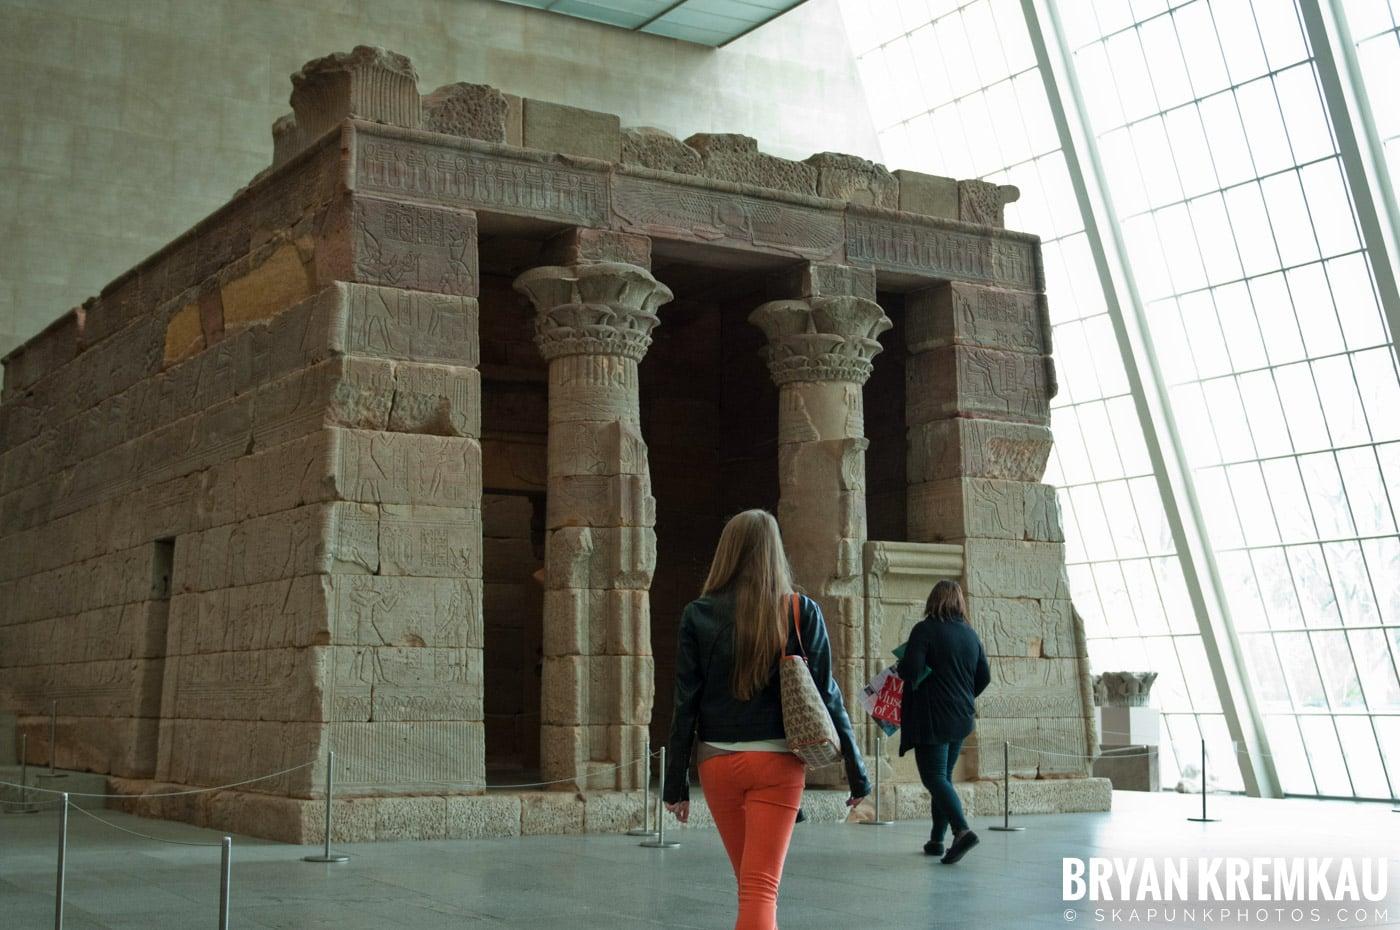 The Metropolitan Museum of Art and Shake Shack @ New York, NY - 3.24.12 (47)